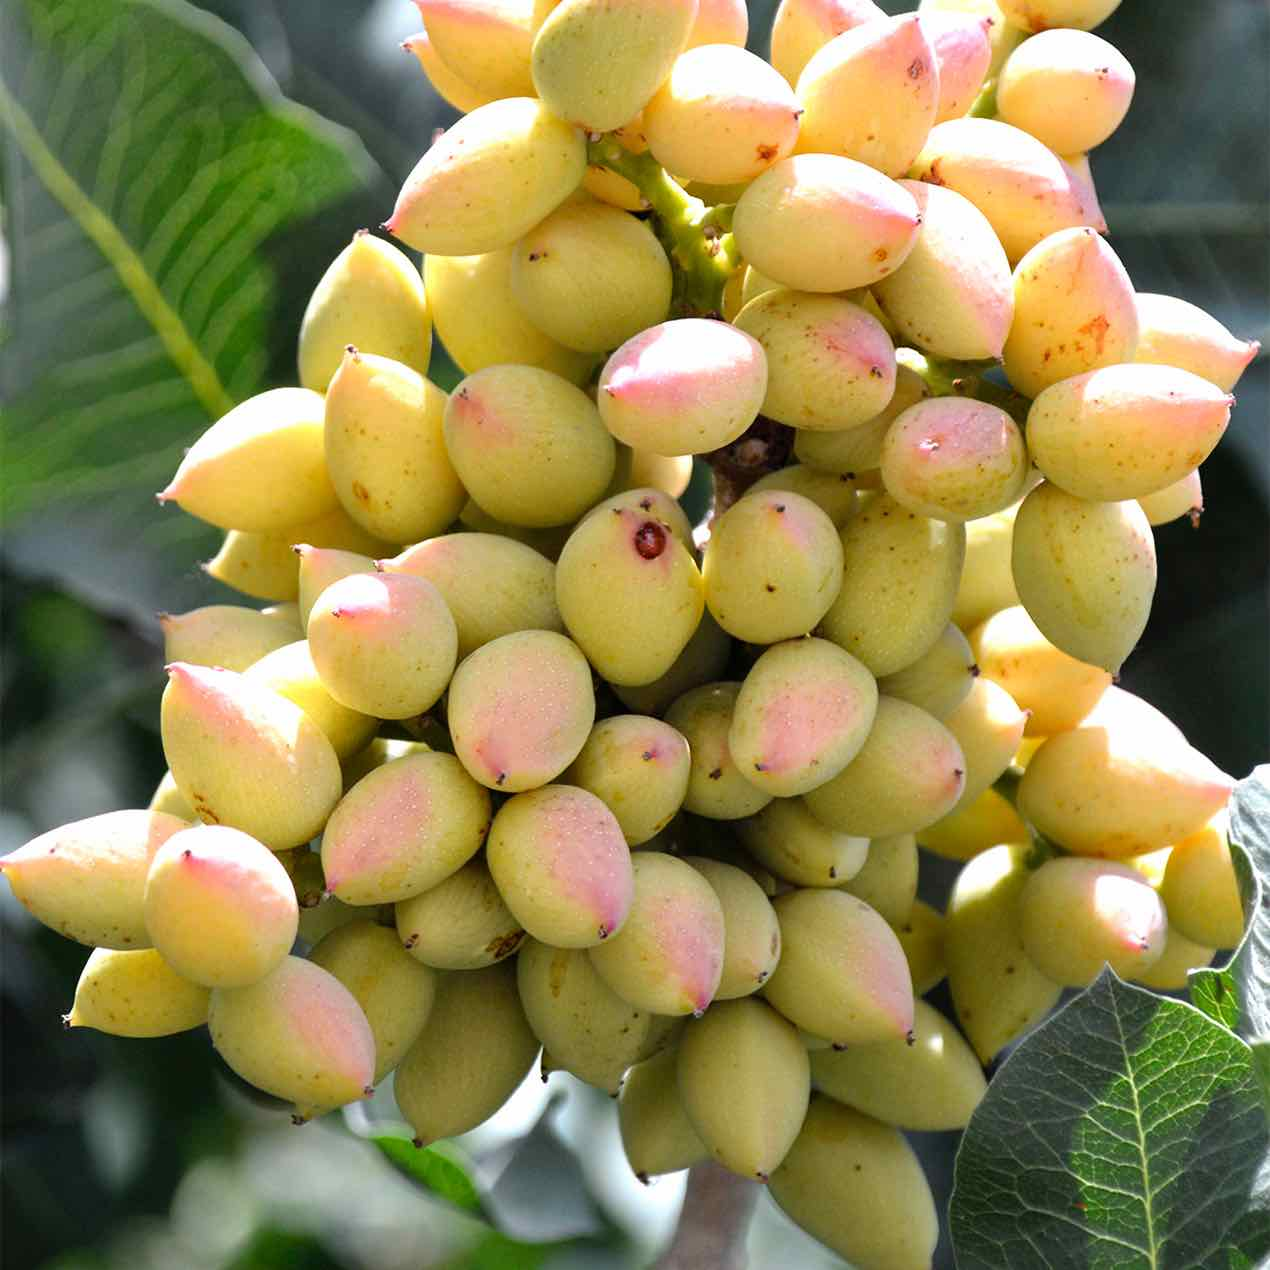 Nut Trees 187 Store 187 Tomorrow S Harvest By Burchell Nursery